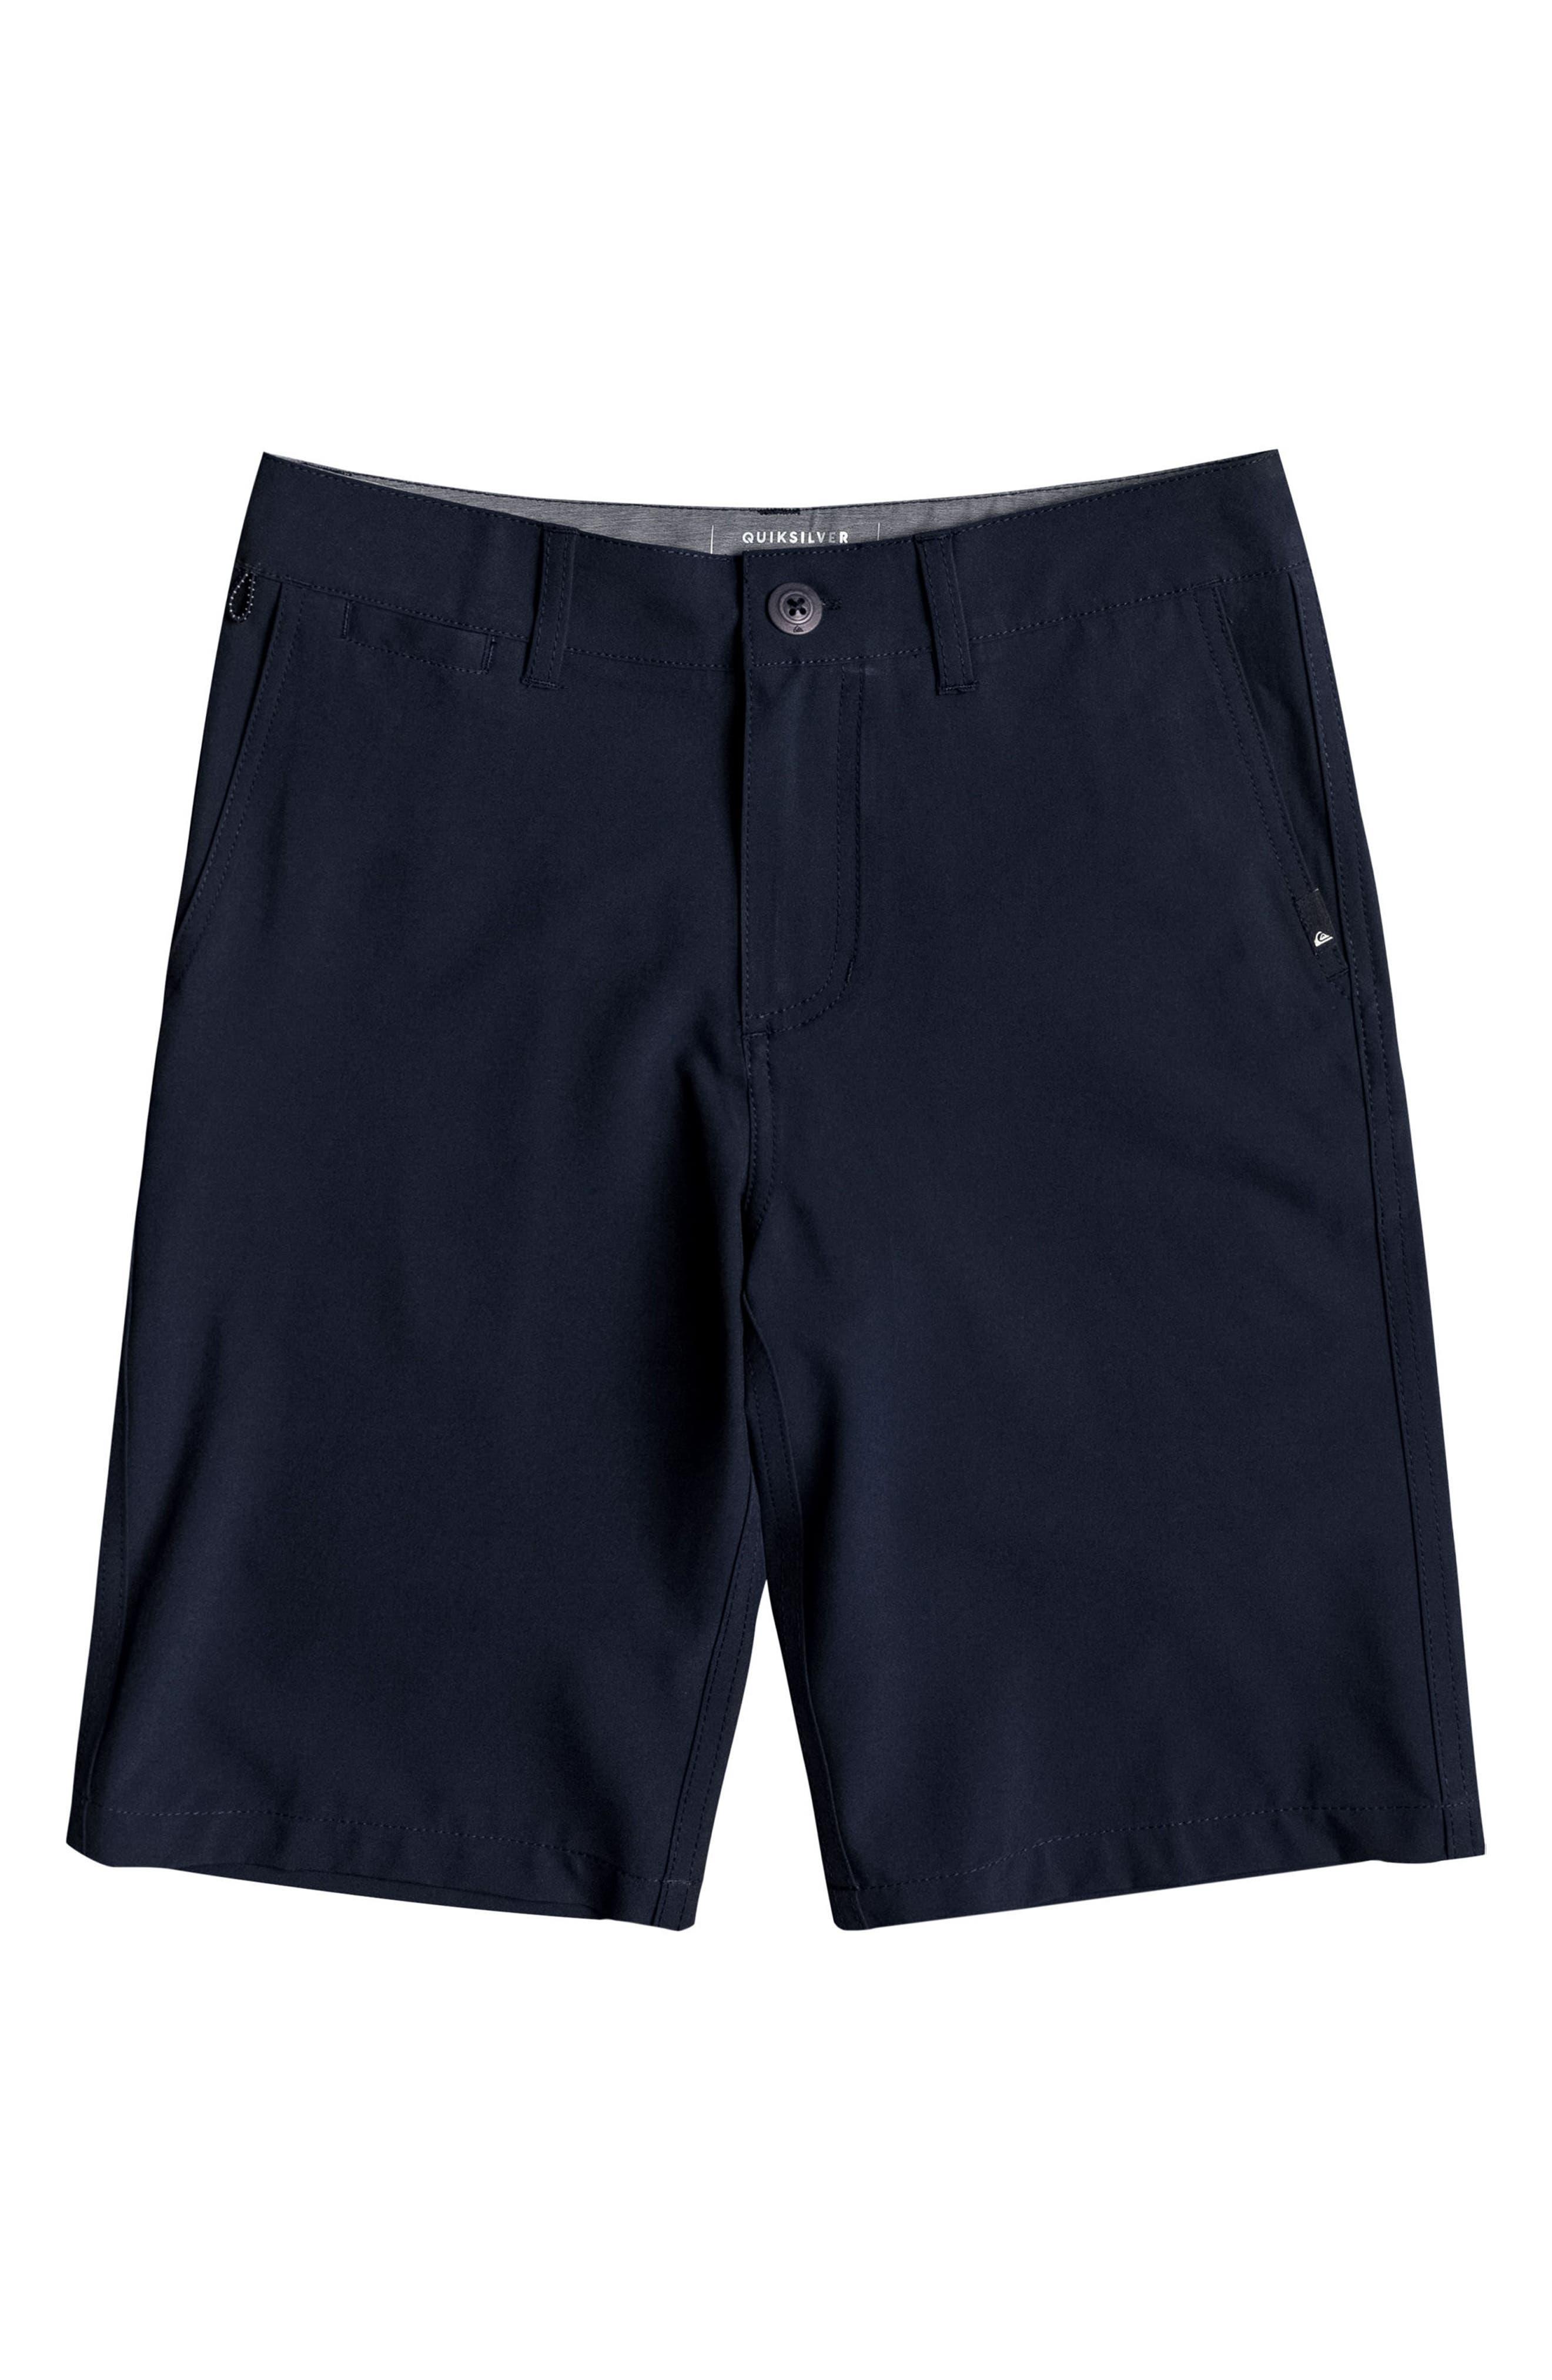 Alternate Image 1 Selected - Quiksilver Union Amphibian Board Shorts (Big Boys)